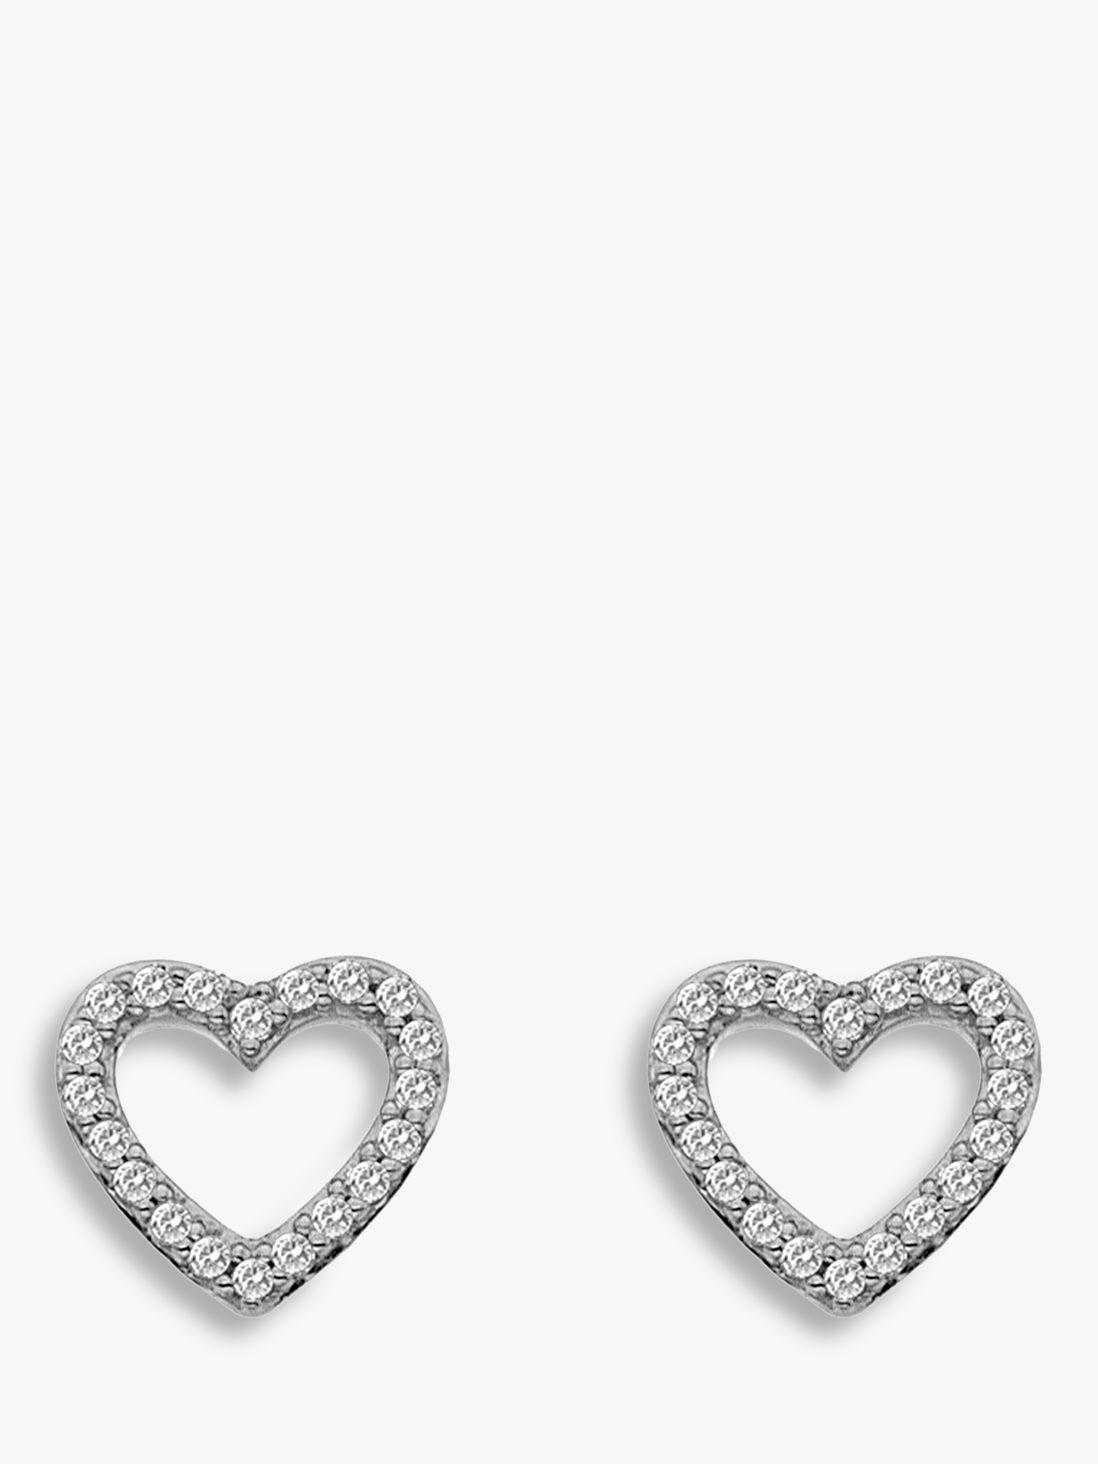 Hot Diamonds Hot Diamonds 9ct White Gold Ripple Heart Stud Earrings